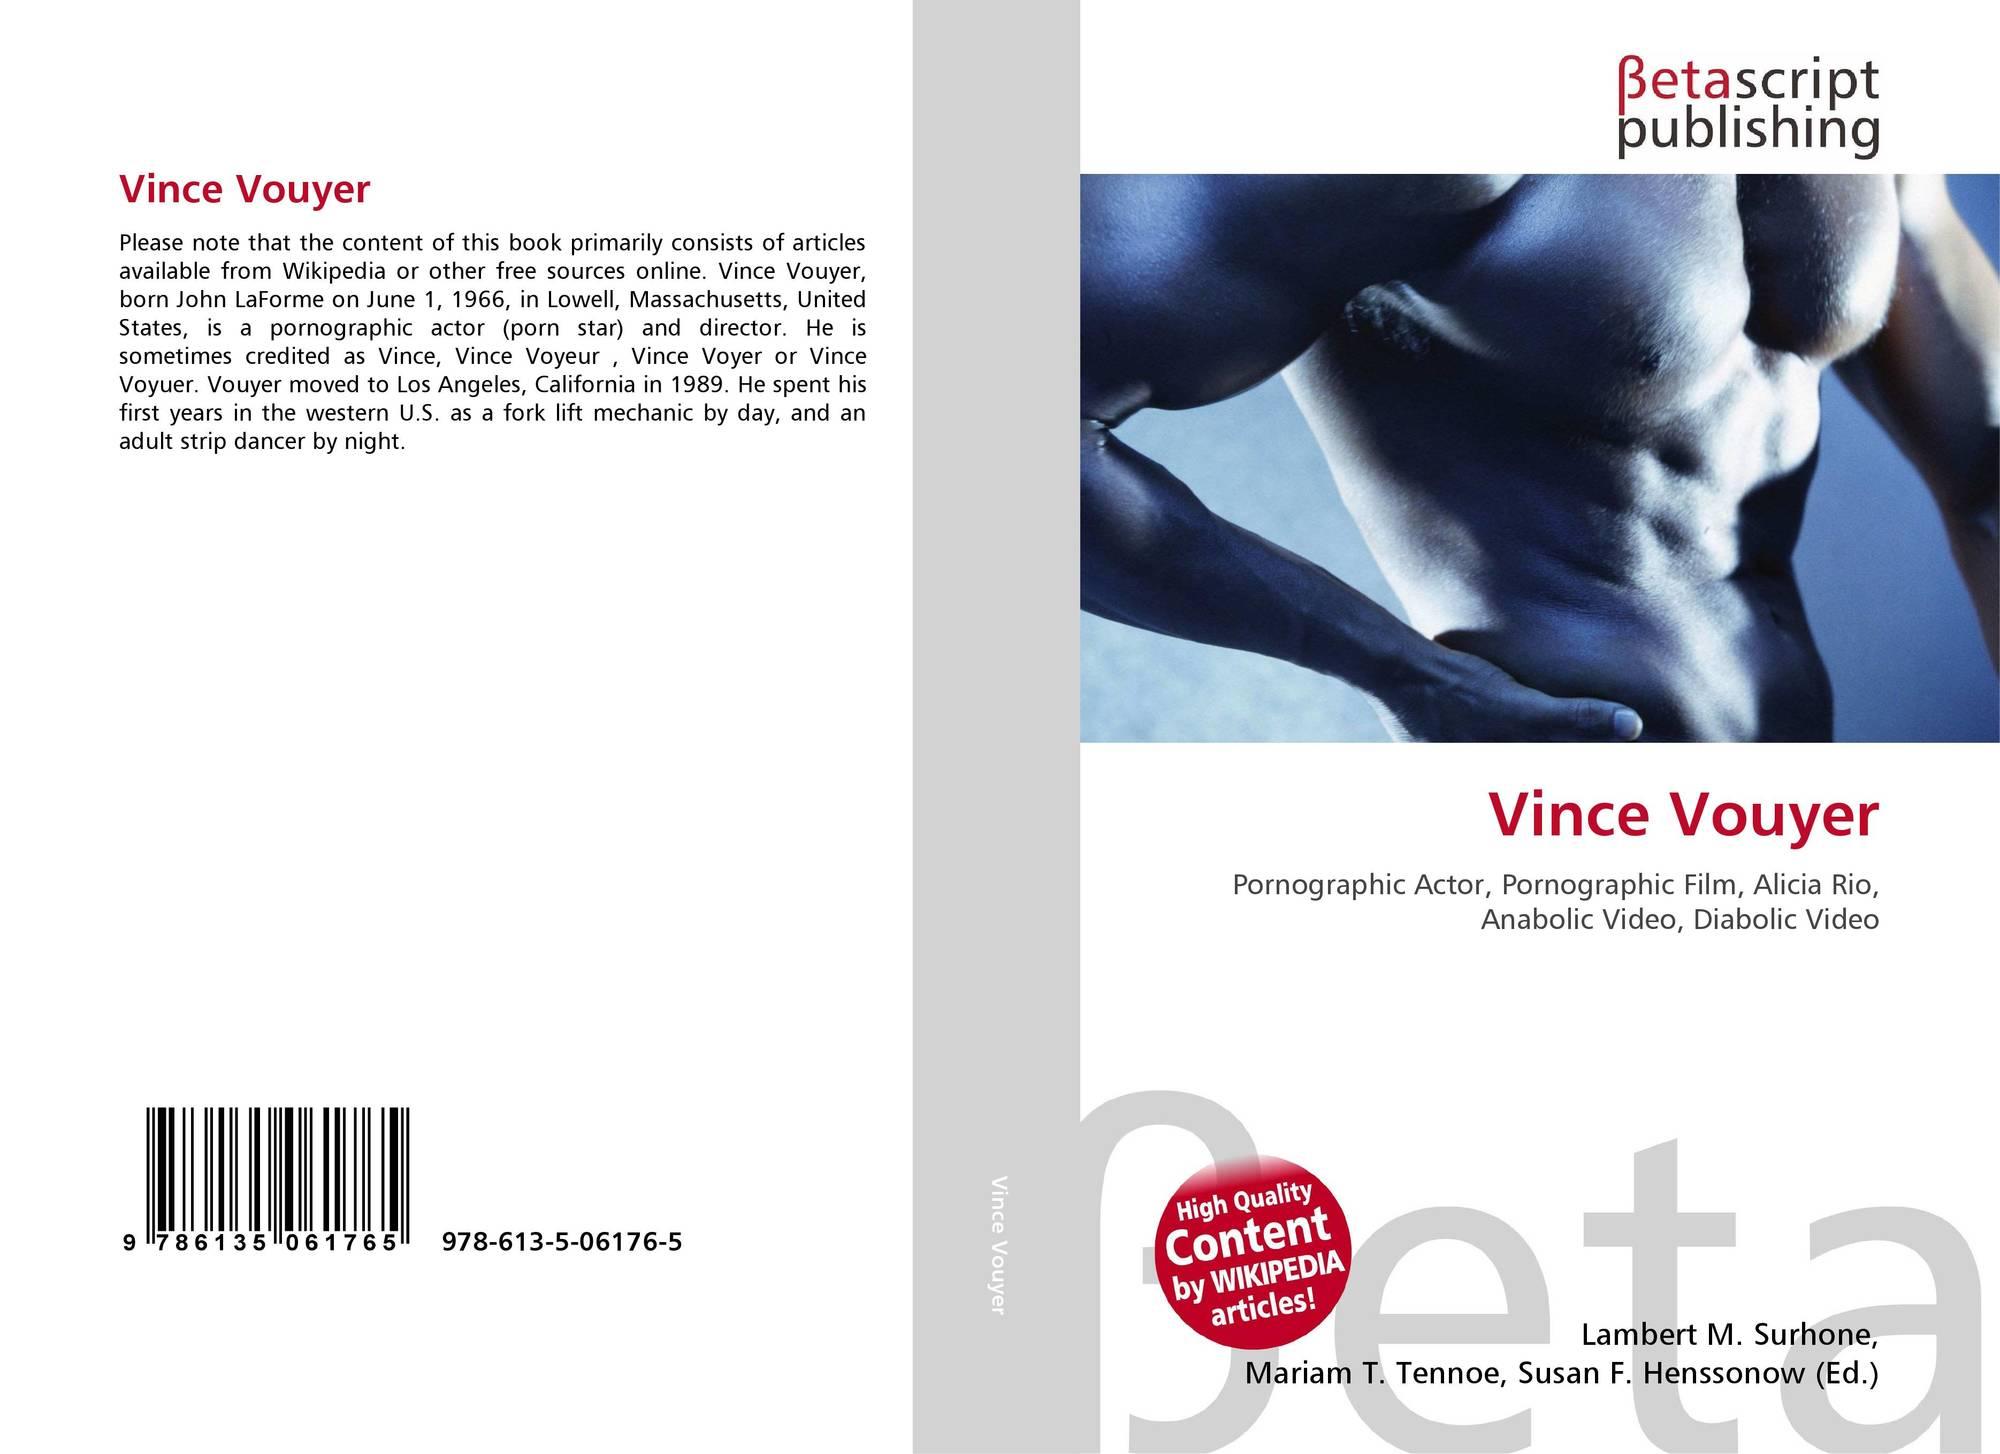 Vince Vouyer